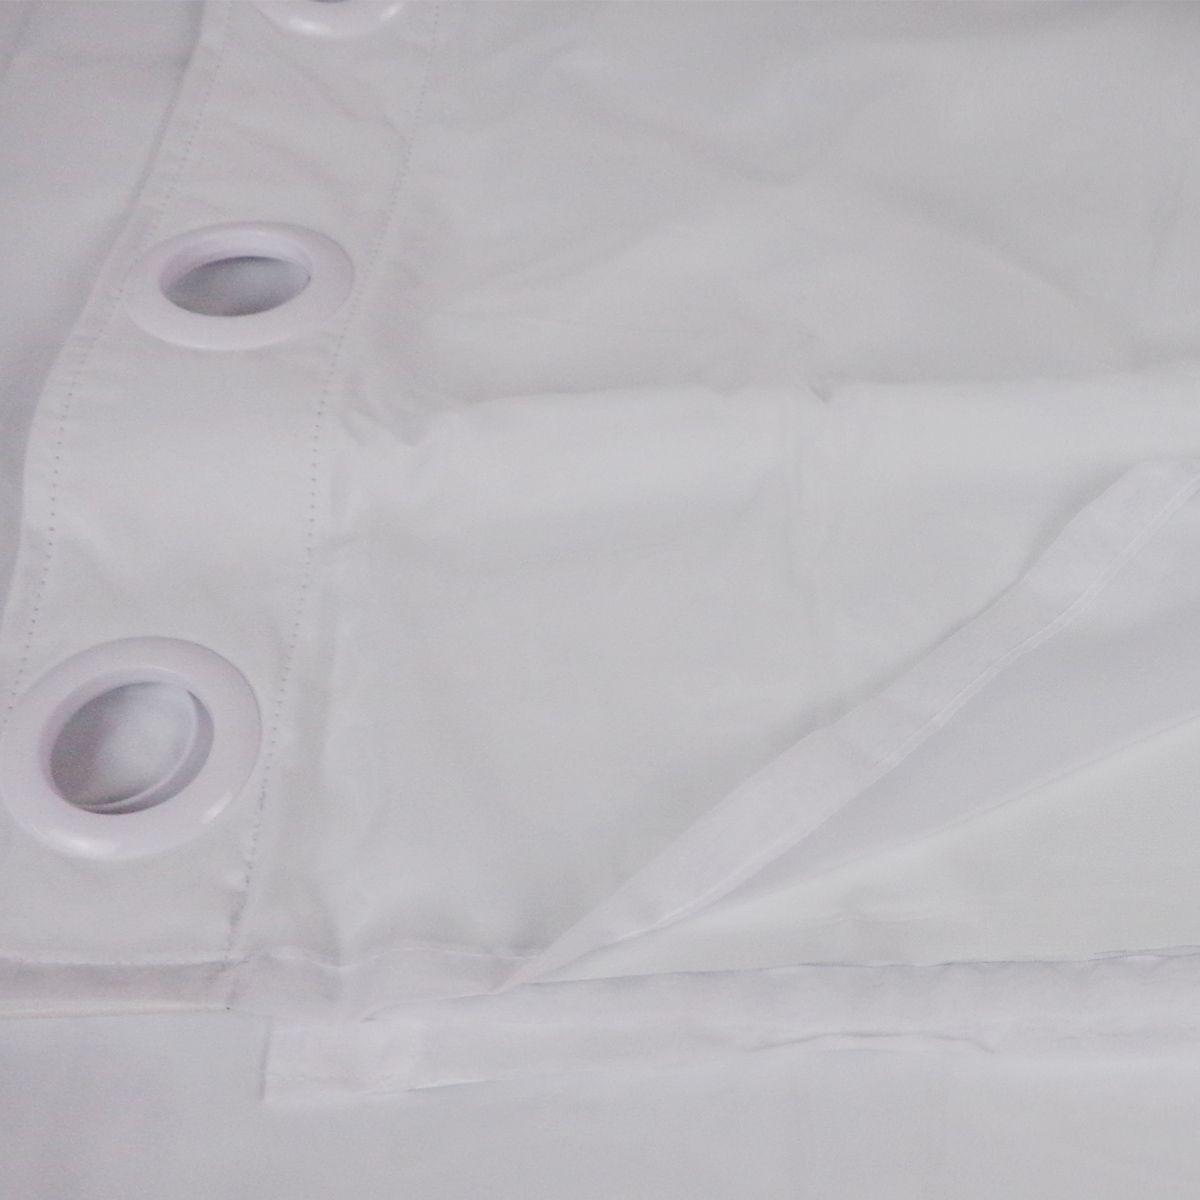 Cortina Em Voil Branca Com Forro Blackout 2,60 x 2,30 Bella Janela